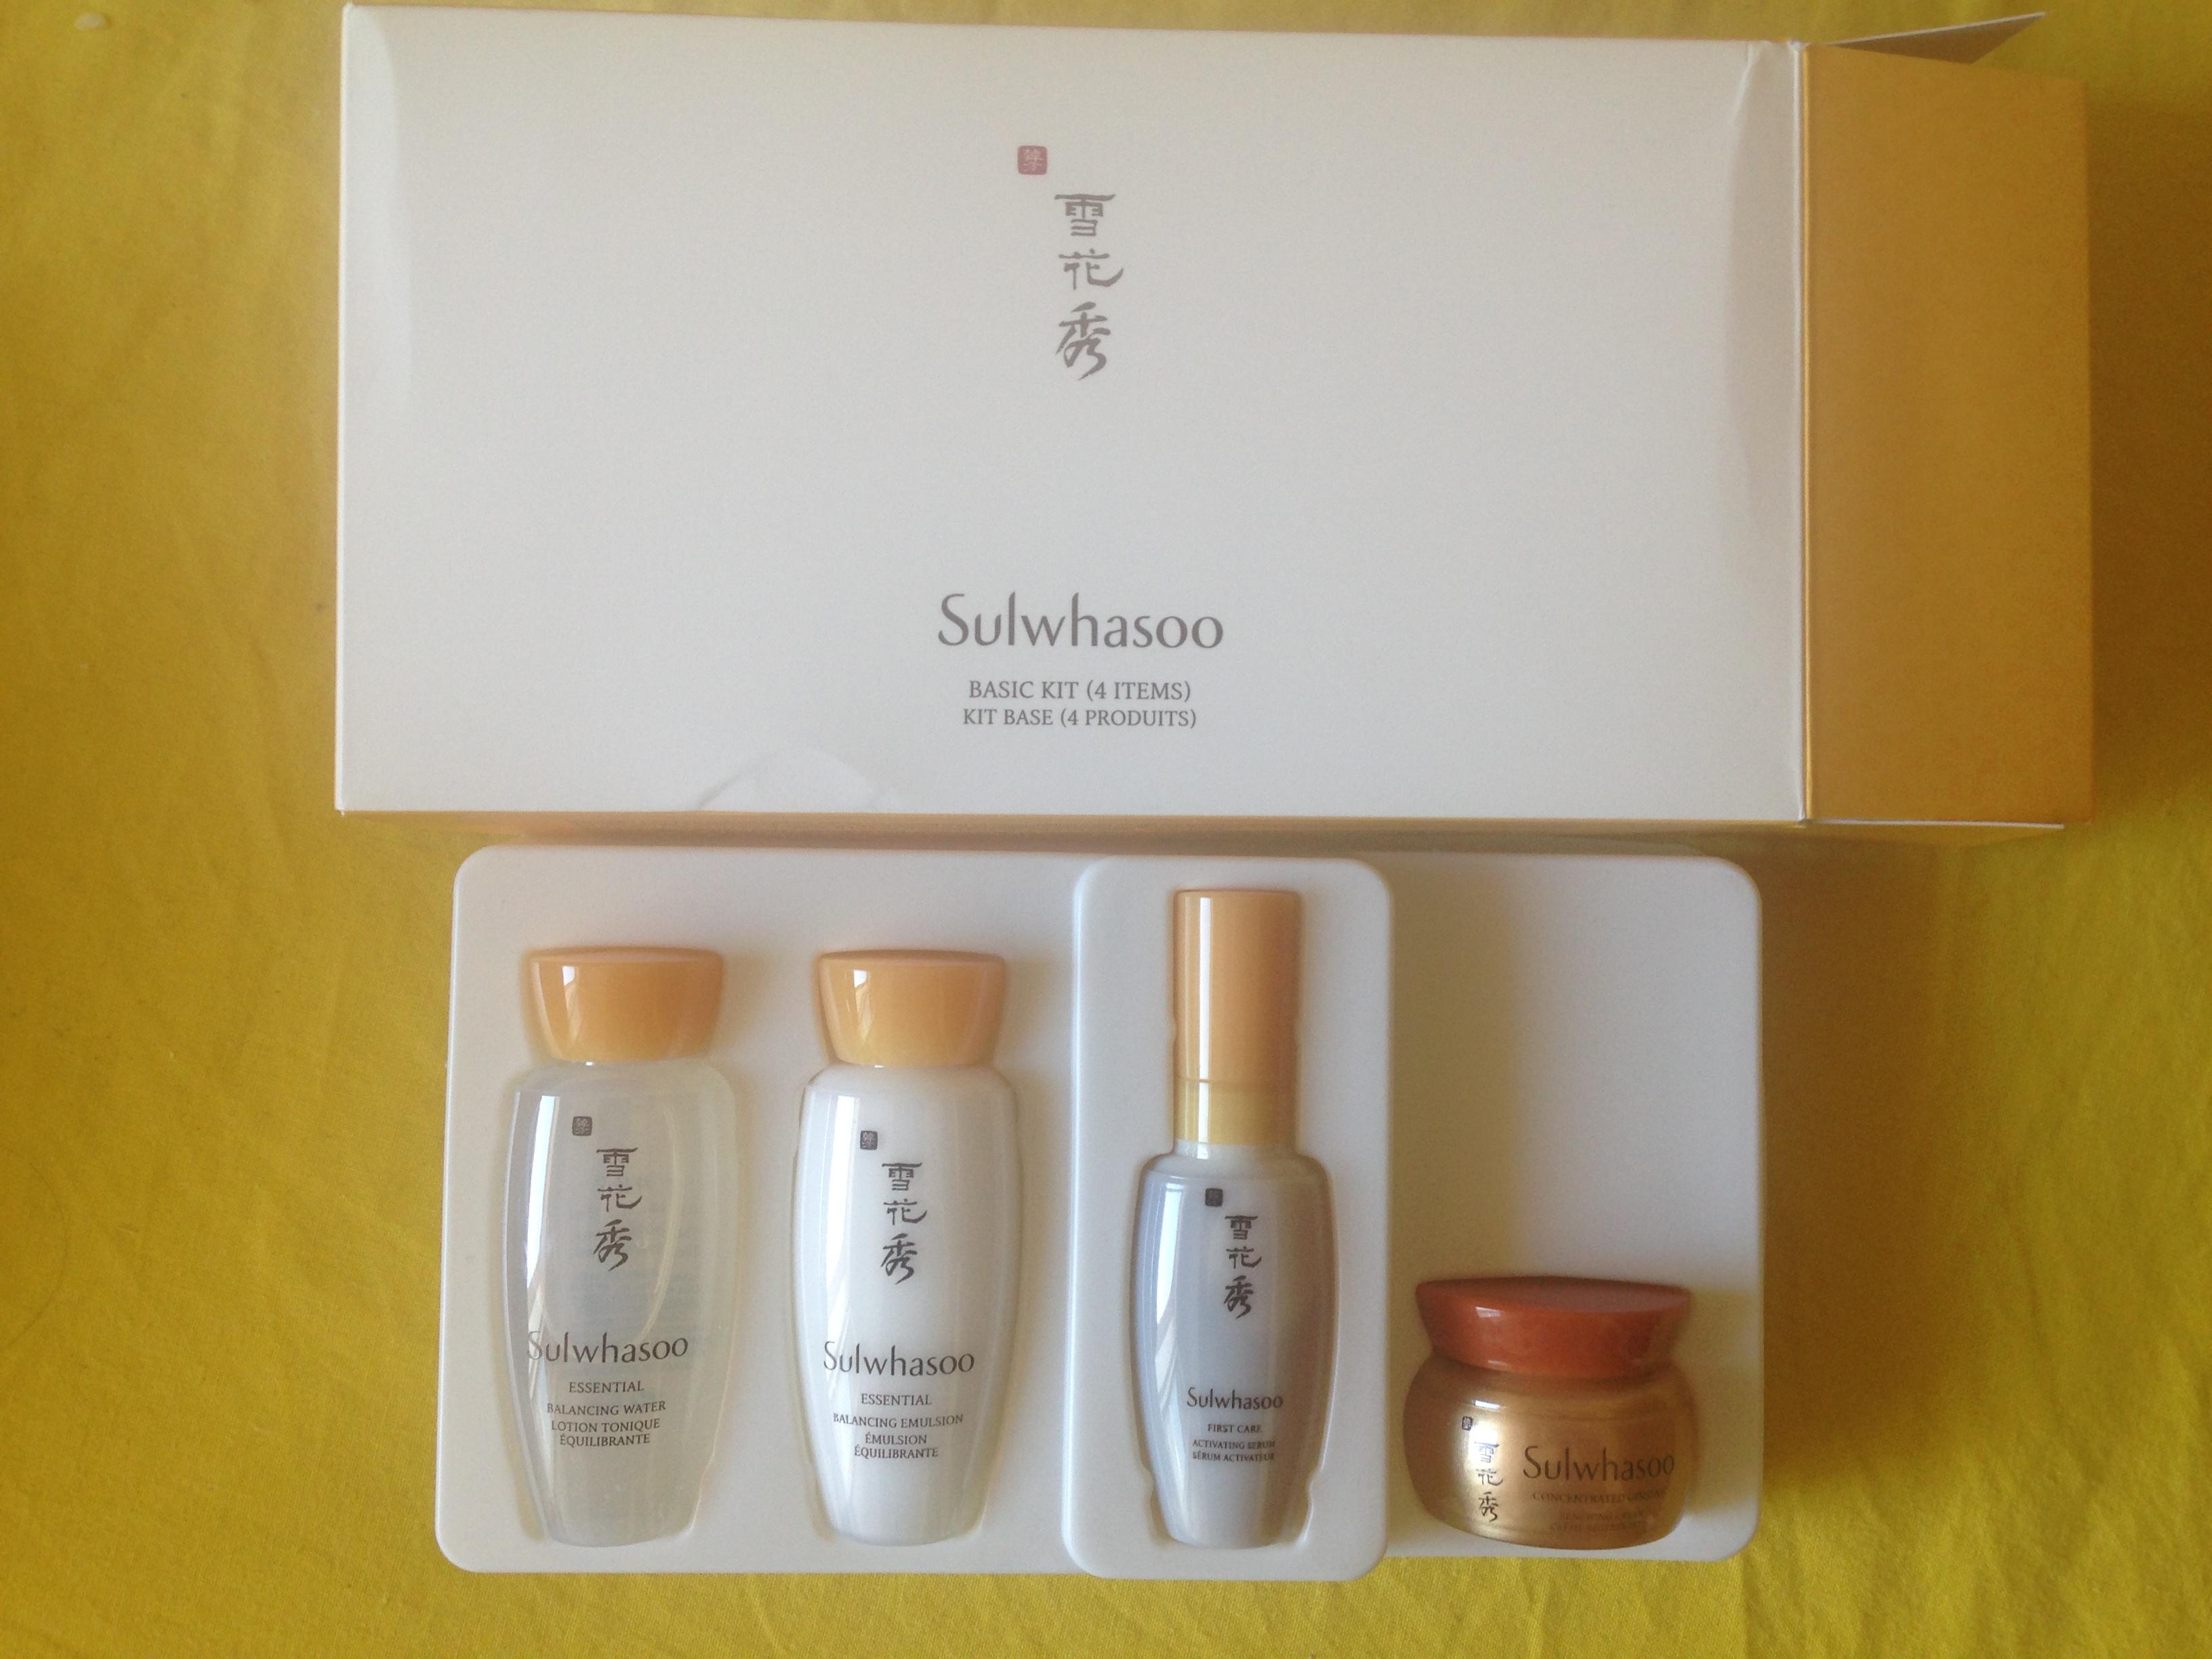 Beauty Troc Sulwhasoo Coffret voyage Kit base 4 produits